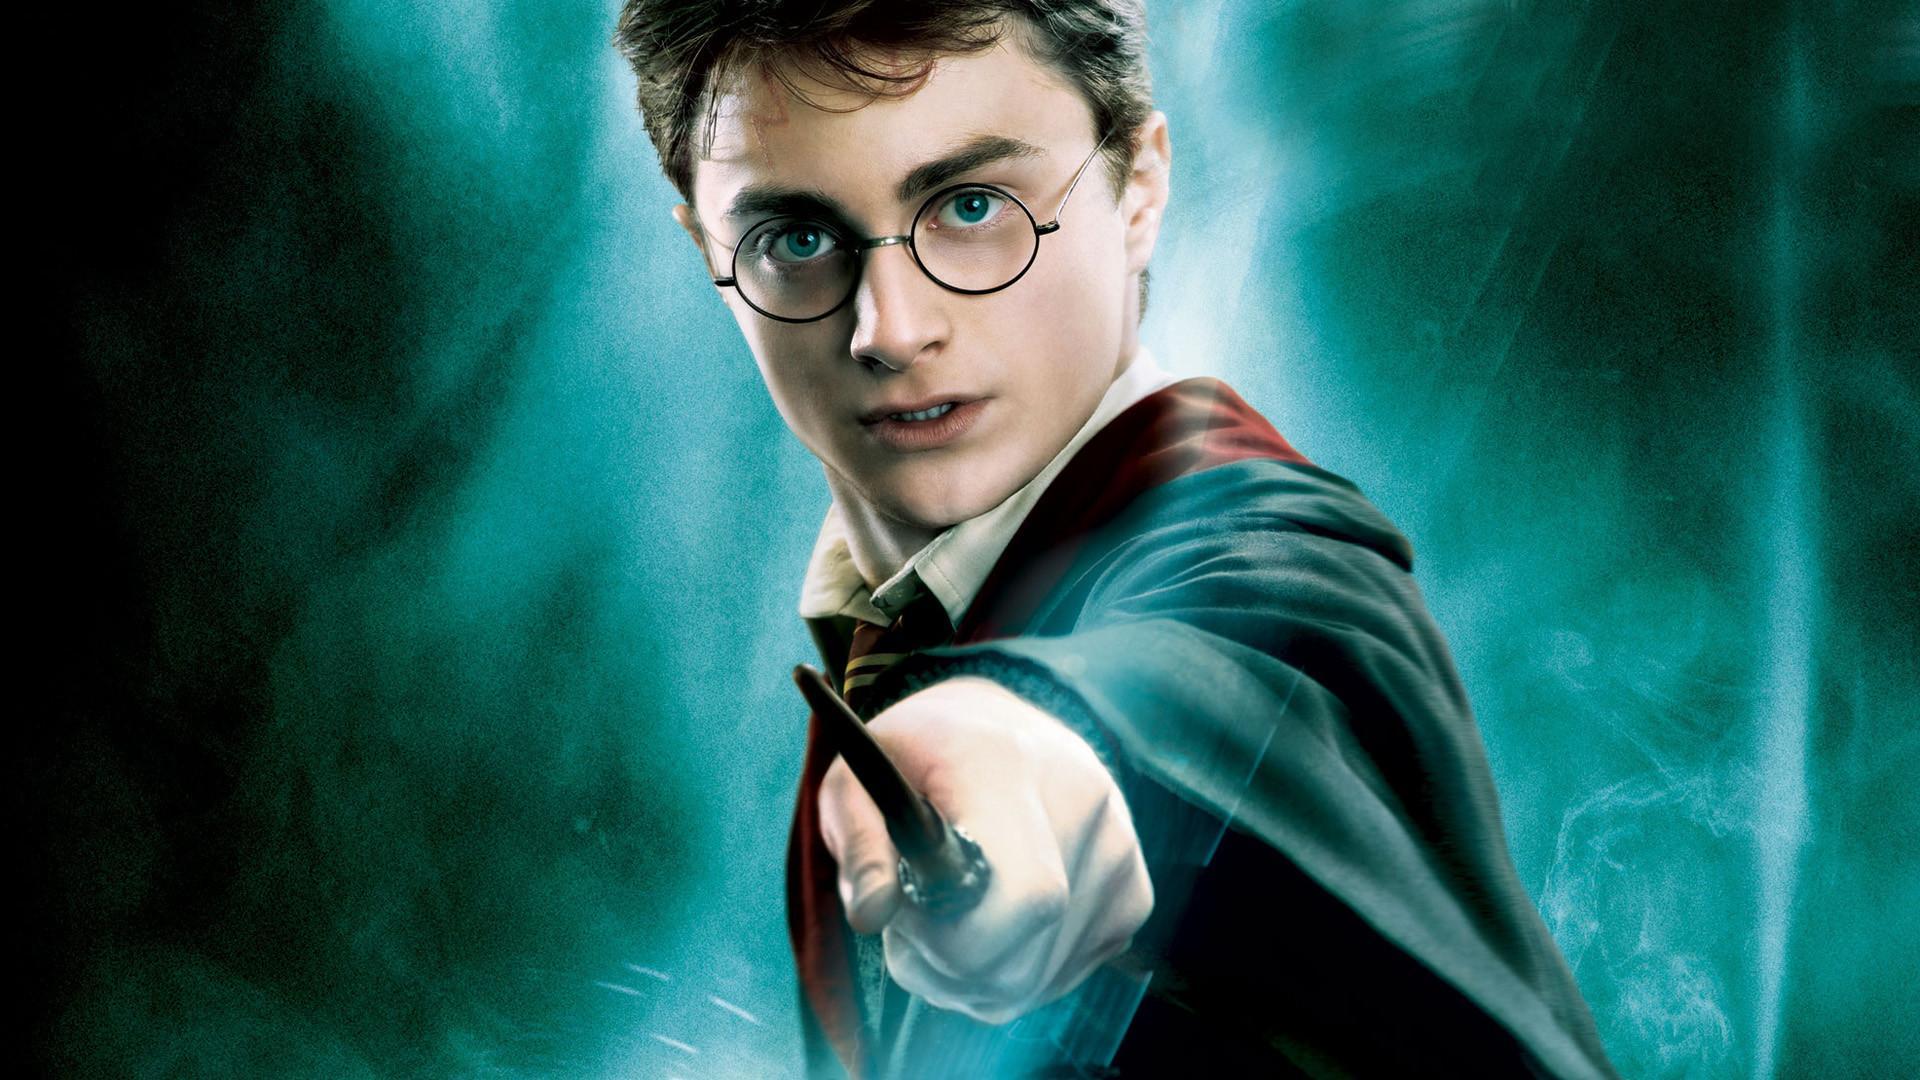 Harry Potter Pics